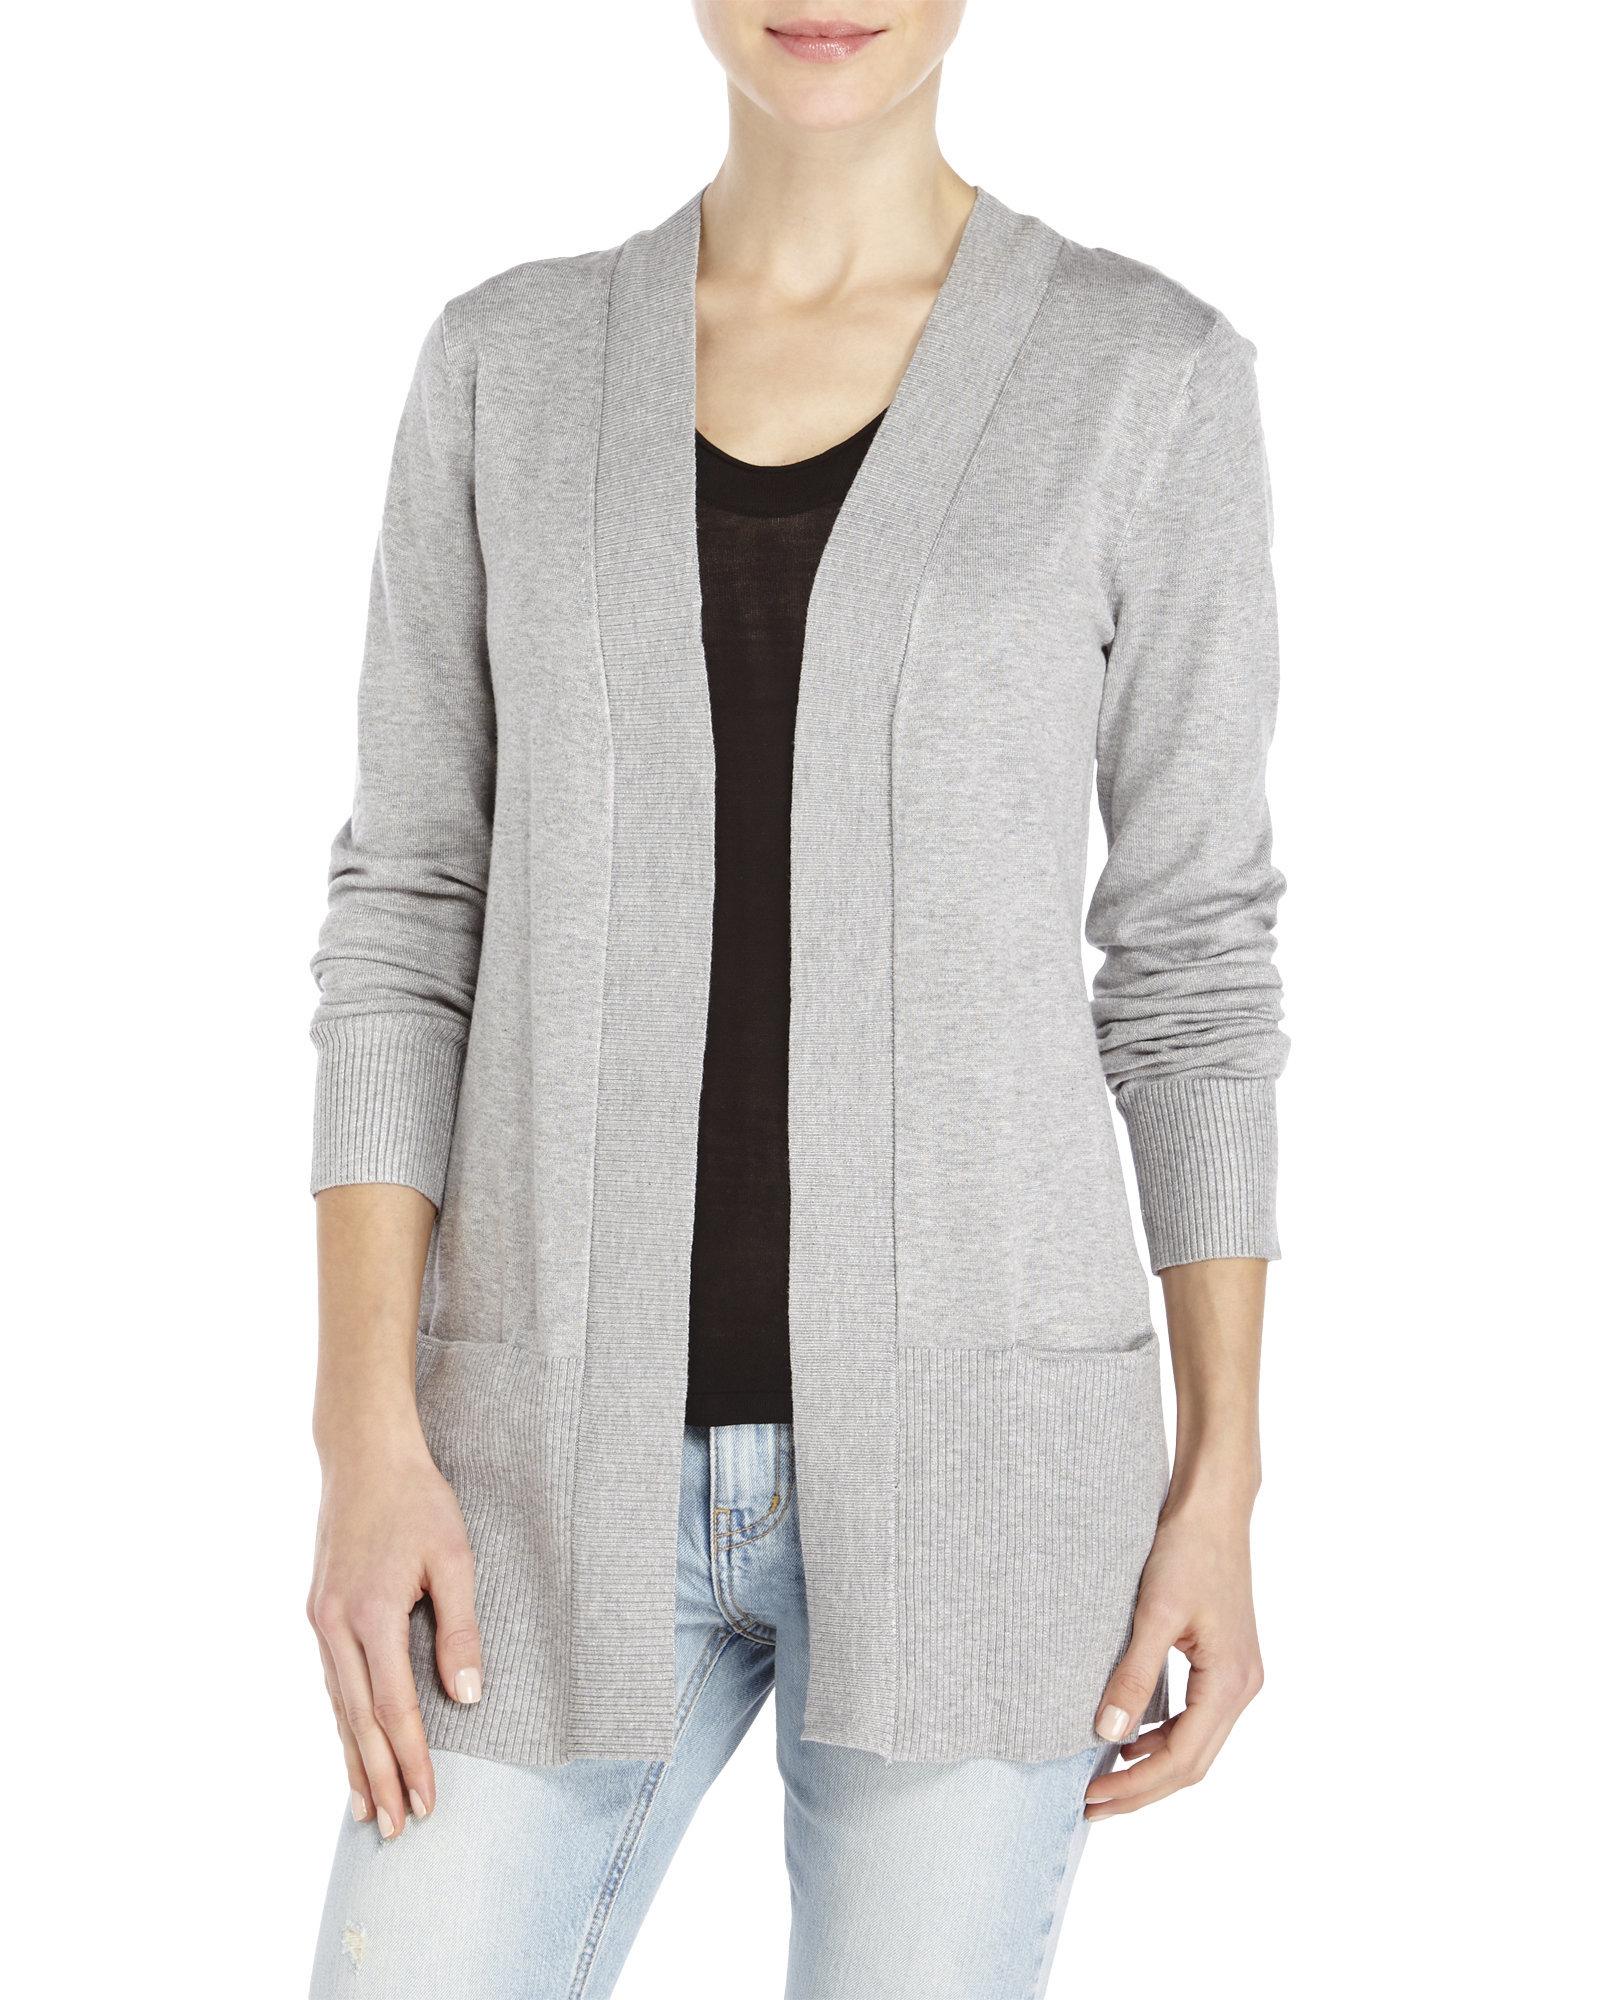 Premise studio Open-Front Knit Cardigan in Gray | Lyst